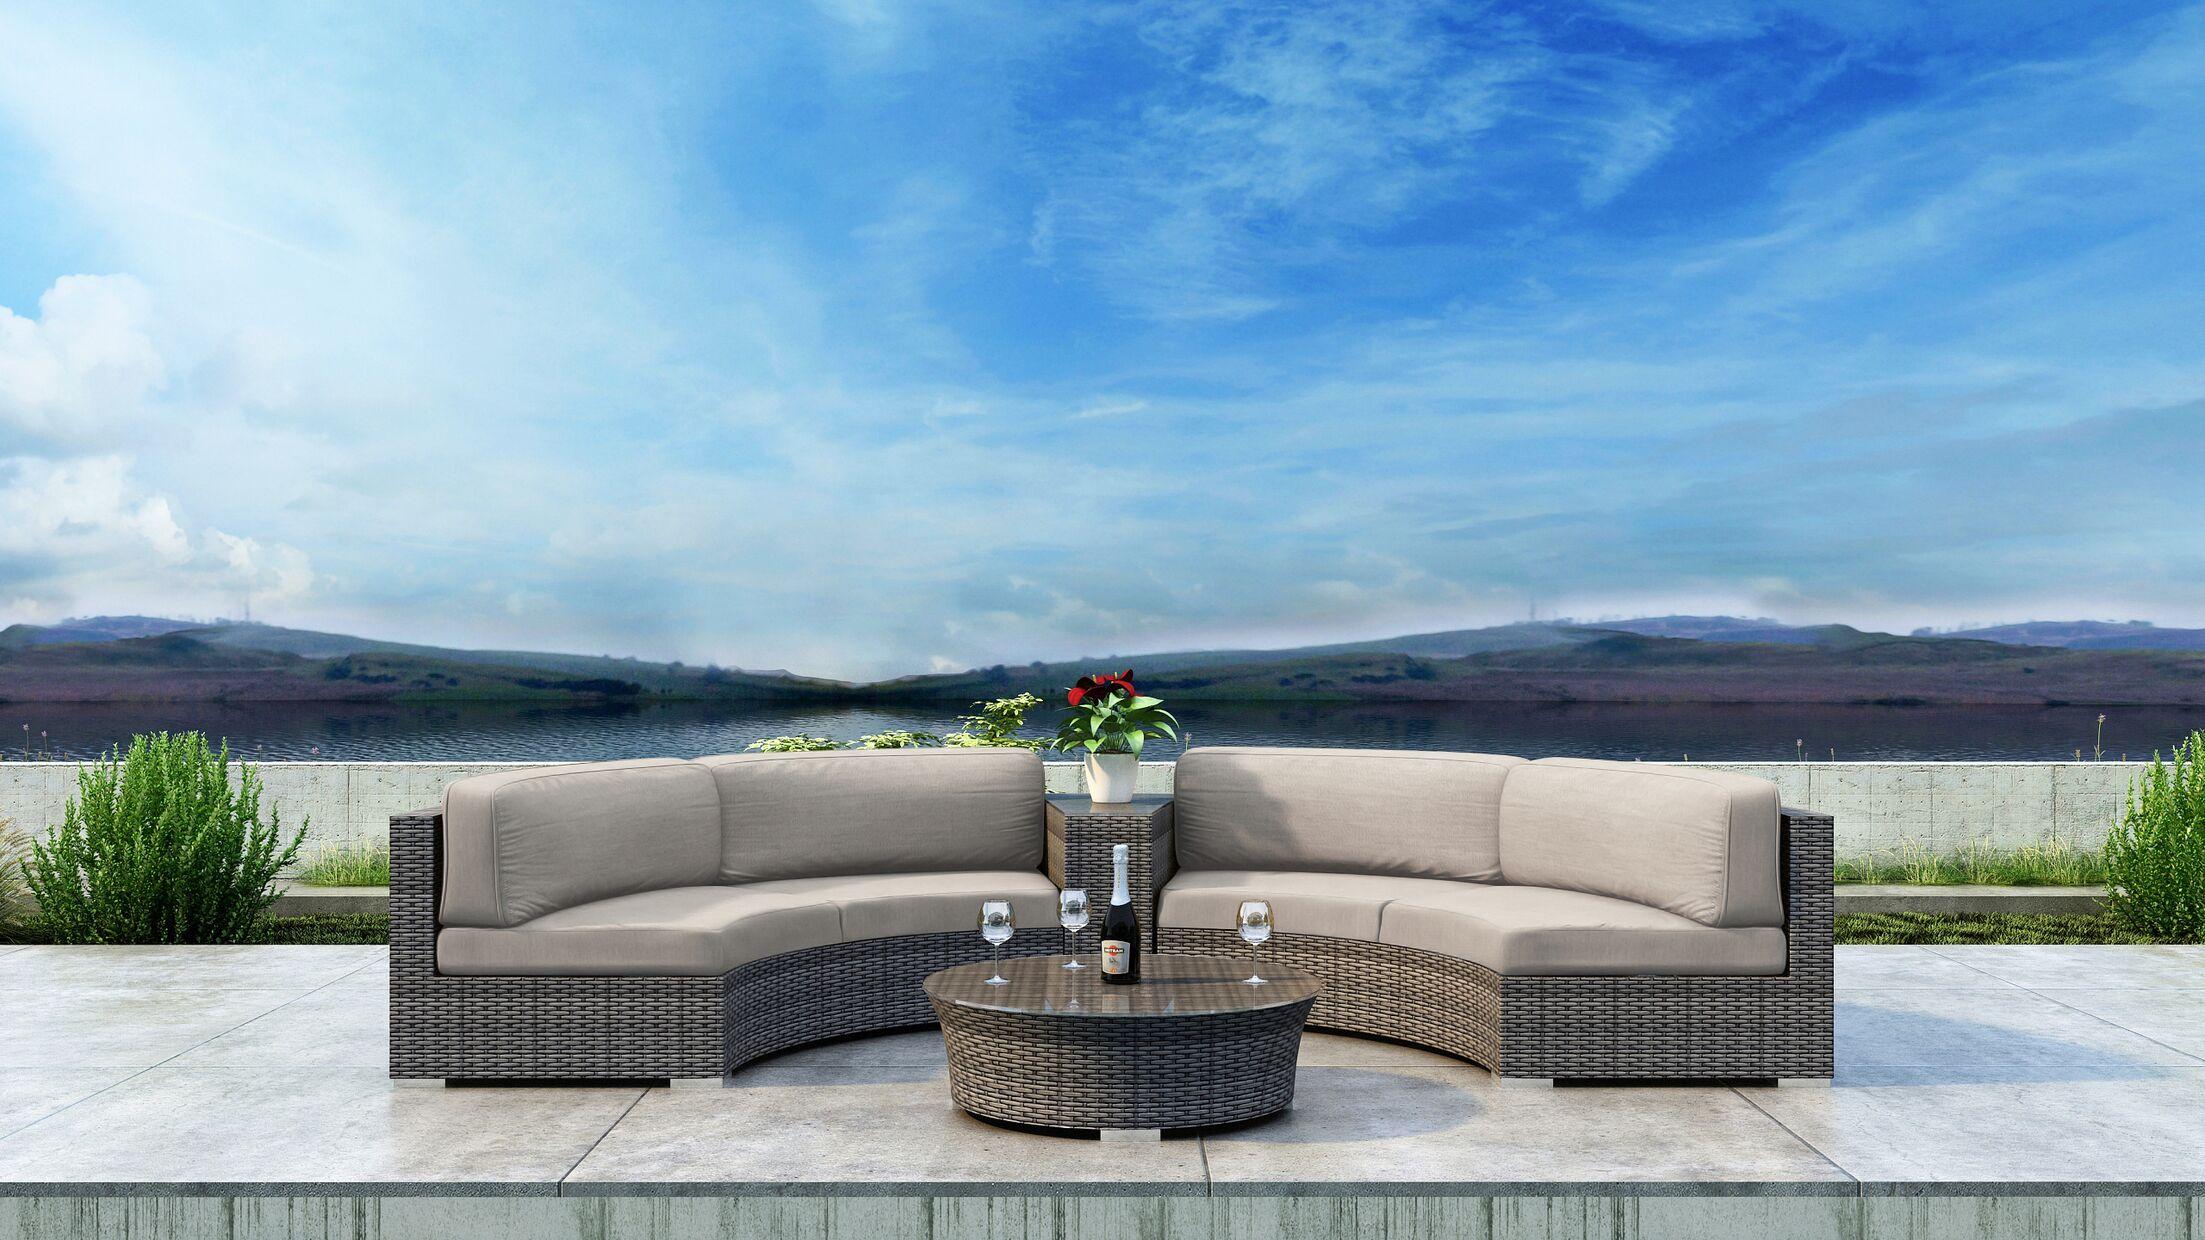 Gilleland 4 Piece Sectional Set with Sunbrella Cushion Cushion Color: Canvas Flax